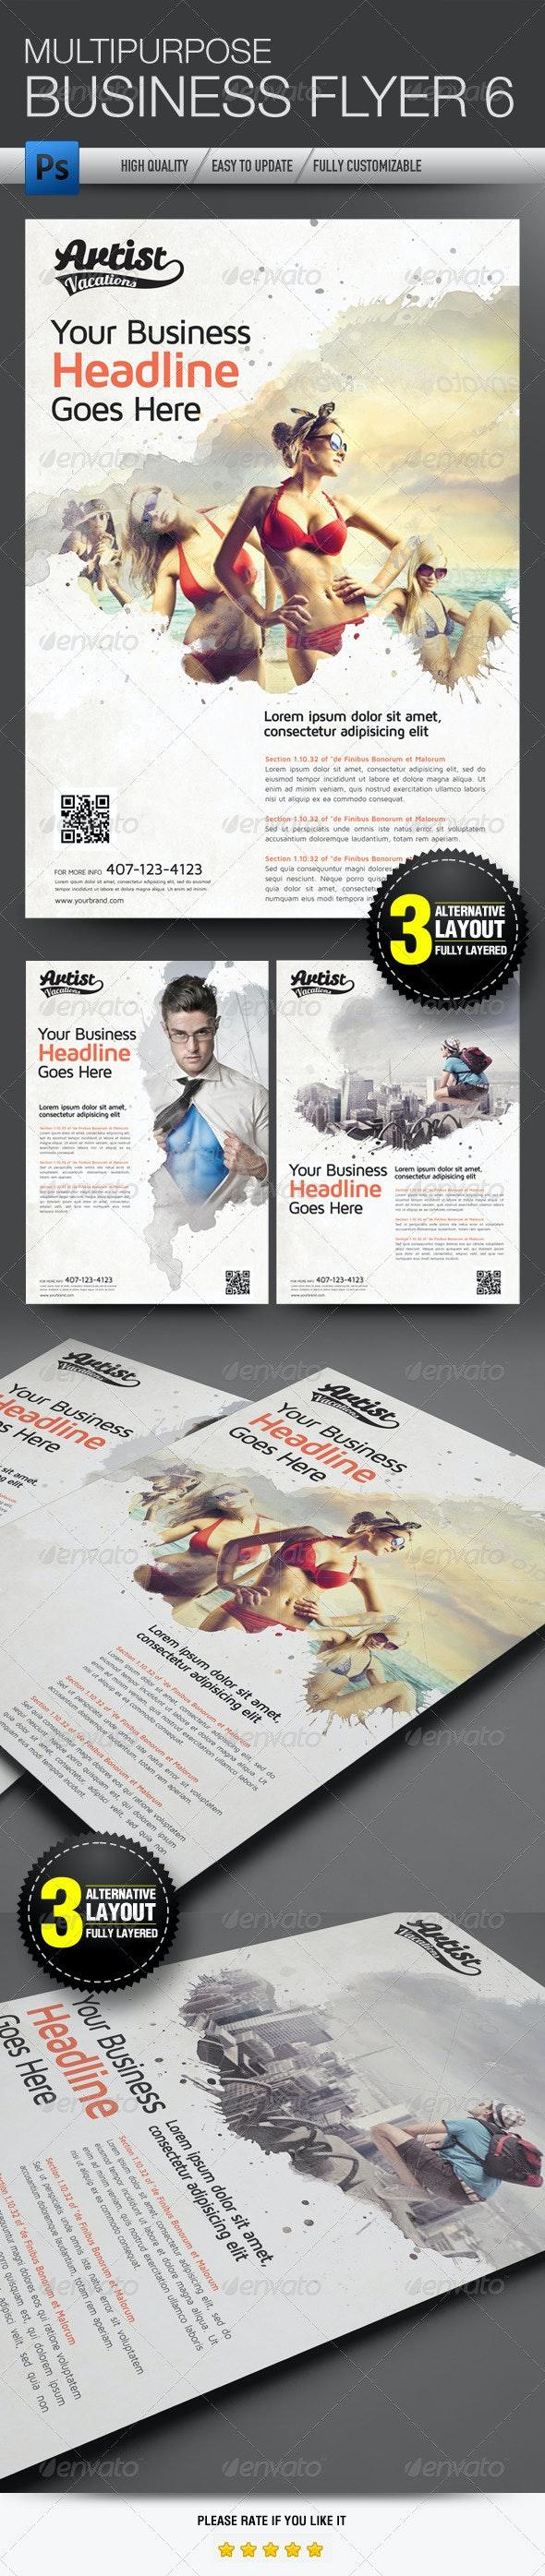 Multipurpose Business Flyer 6 - Flyers Print Templates